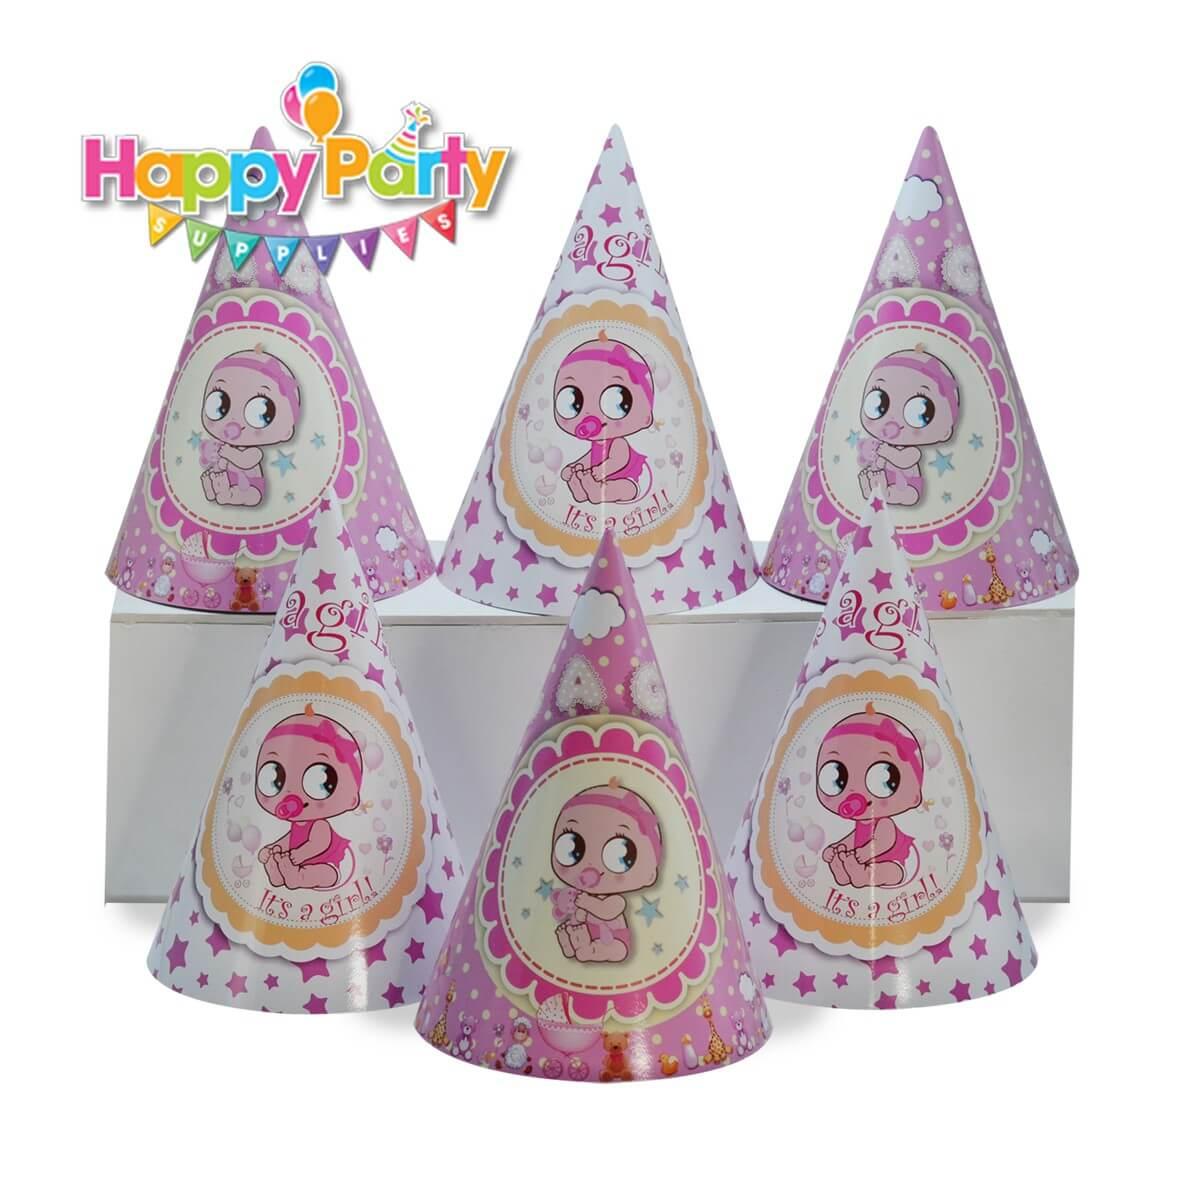 non-giay-chu-de-baby-girl shopphukiensinhnhat.com